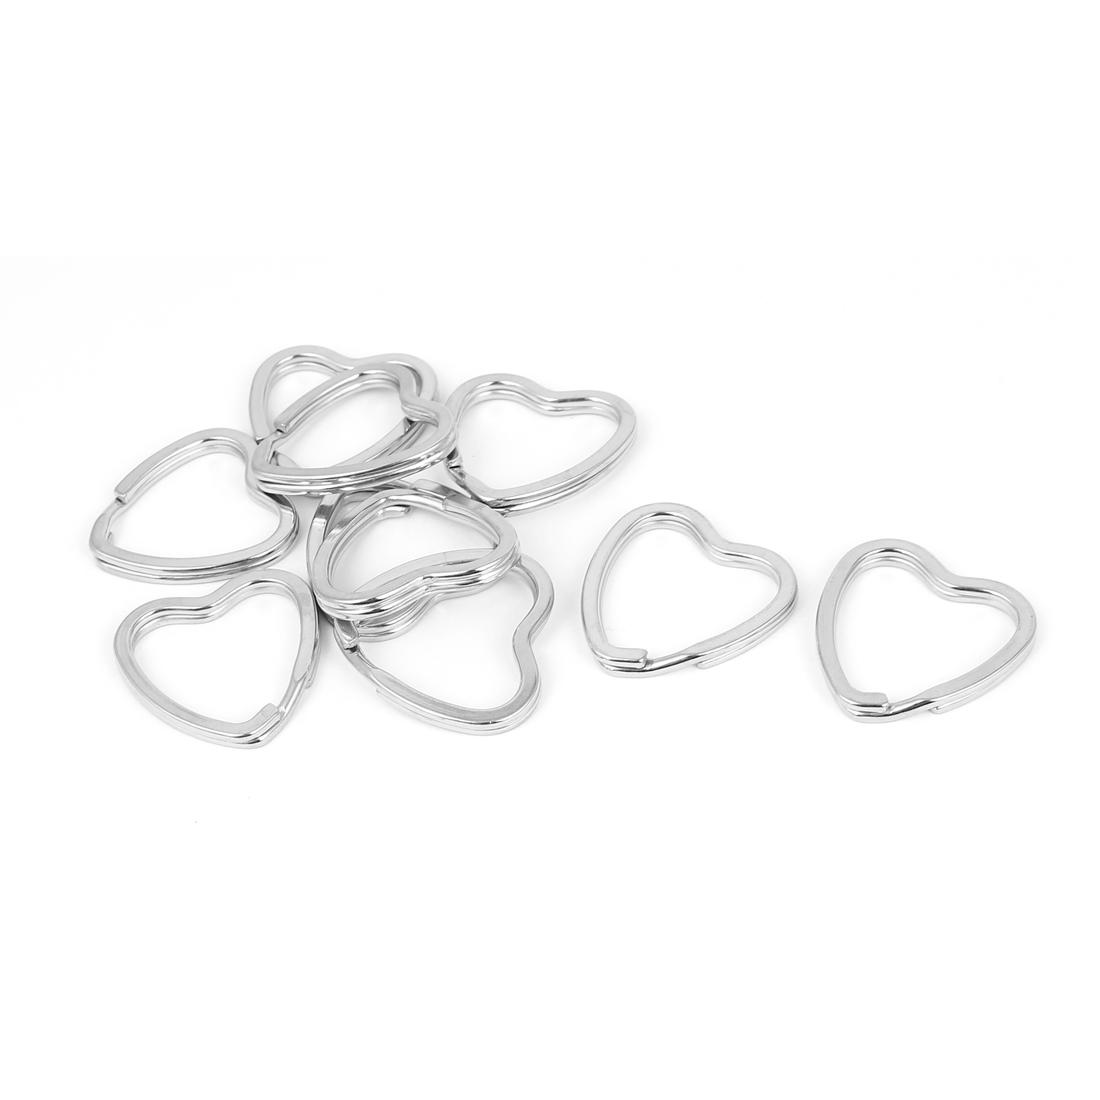 Metal Heart Shape Split Key Ring Jewelry Findings Fit Keyring Silver Tone 10pcs